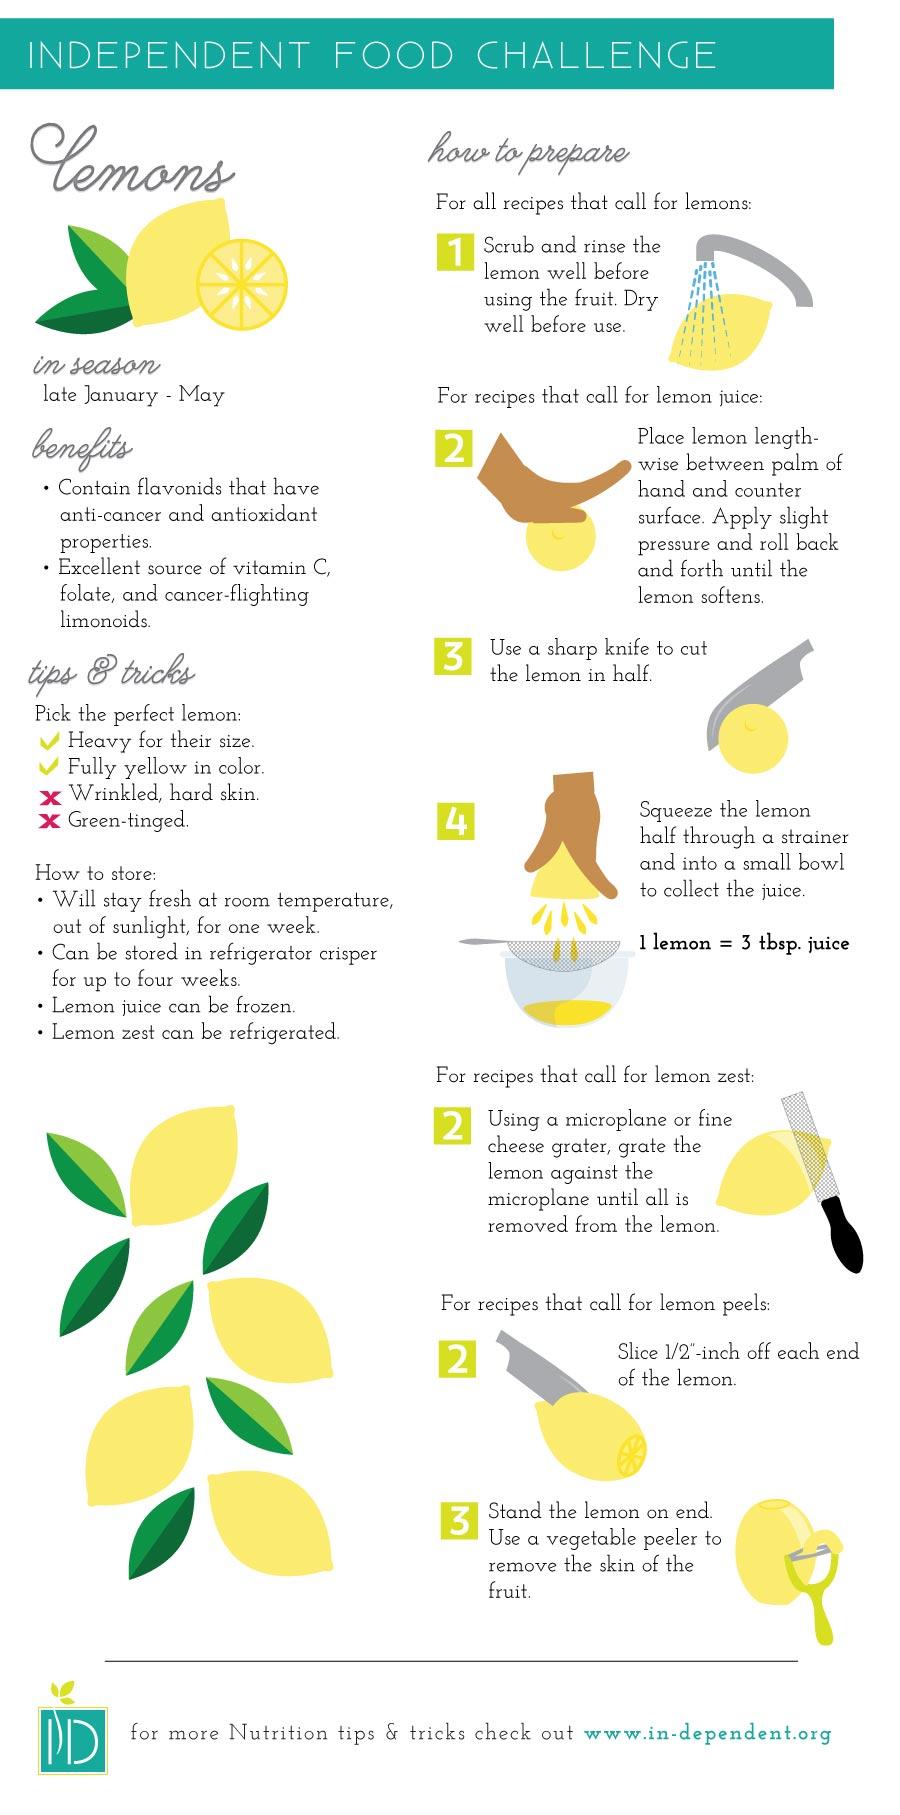 How to prepare Lemons